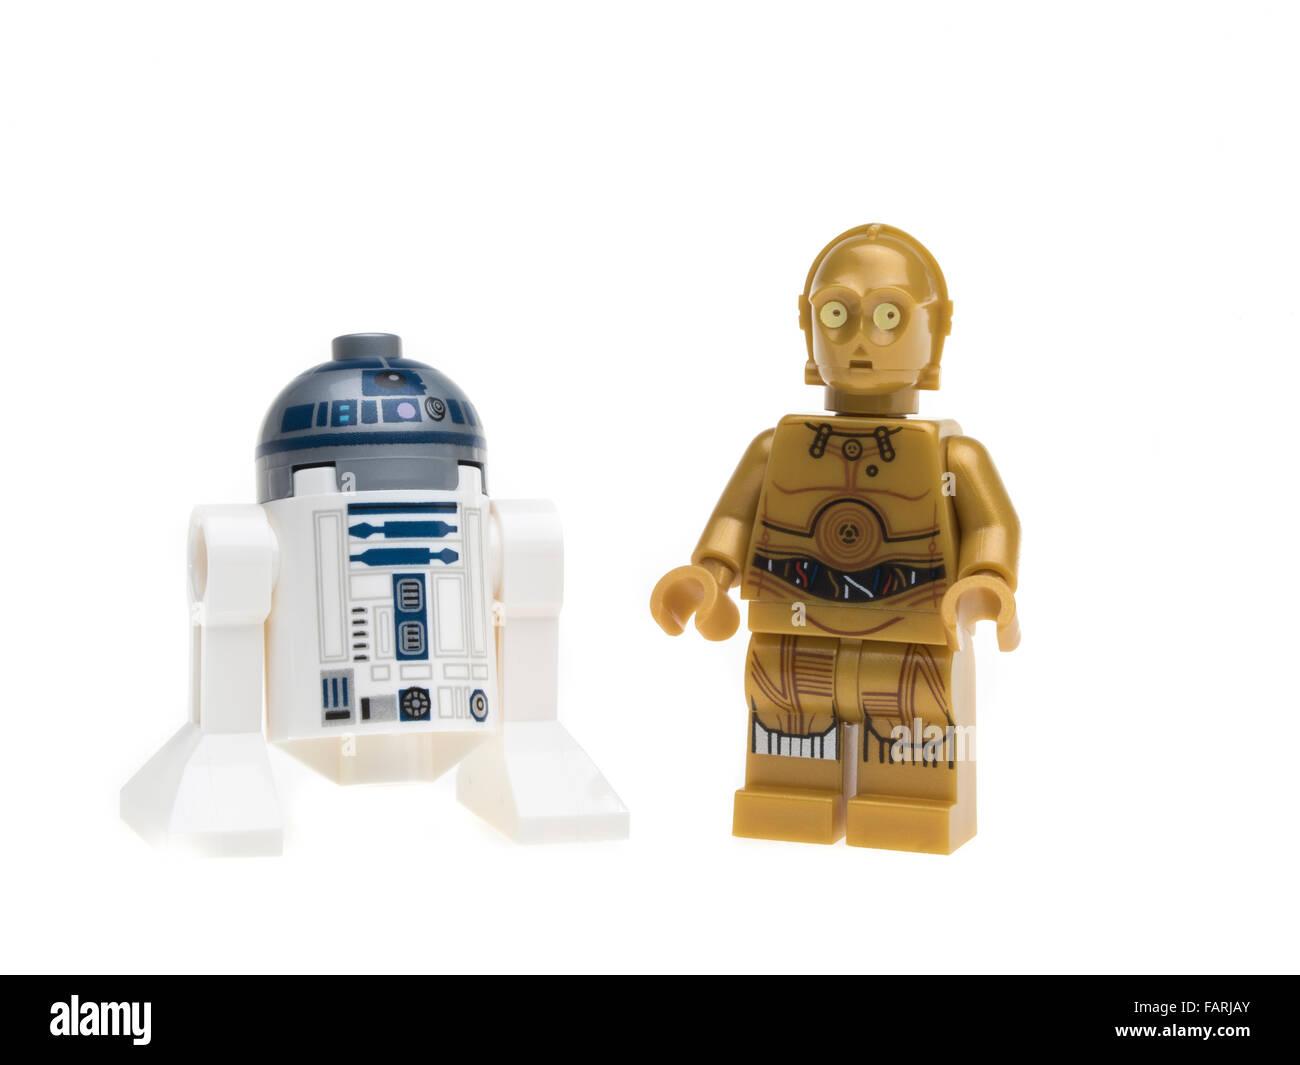 Lego Star Wars R2-D2 C-3P0 minifigure - Stock Image